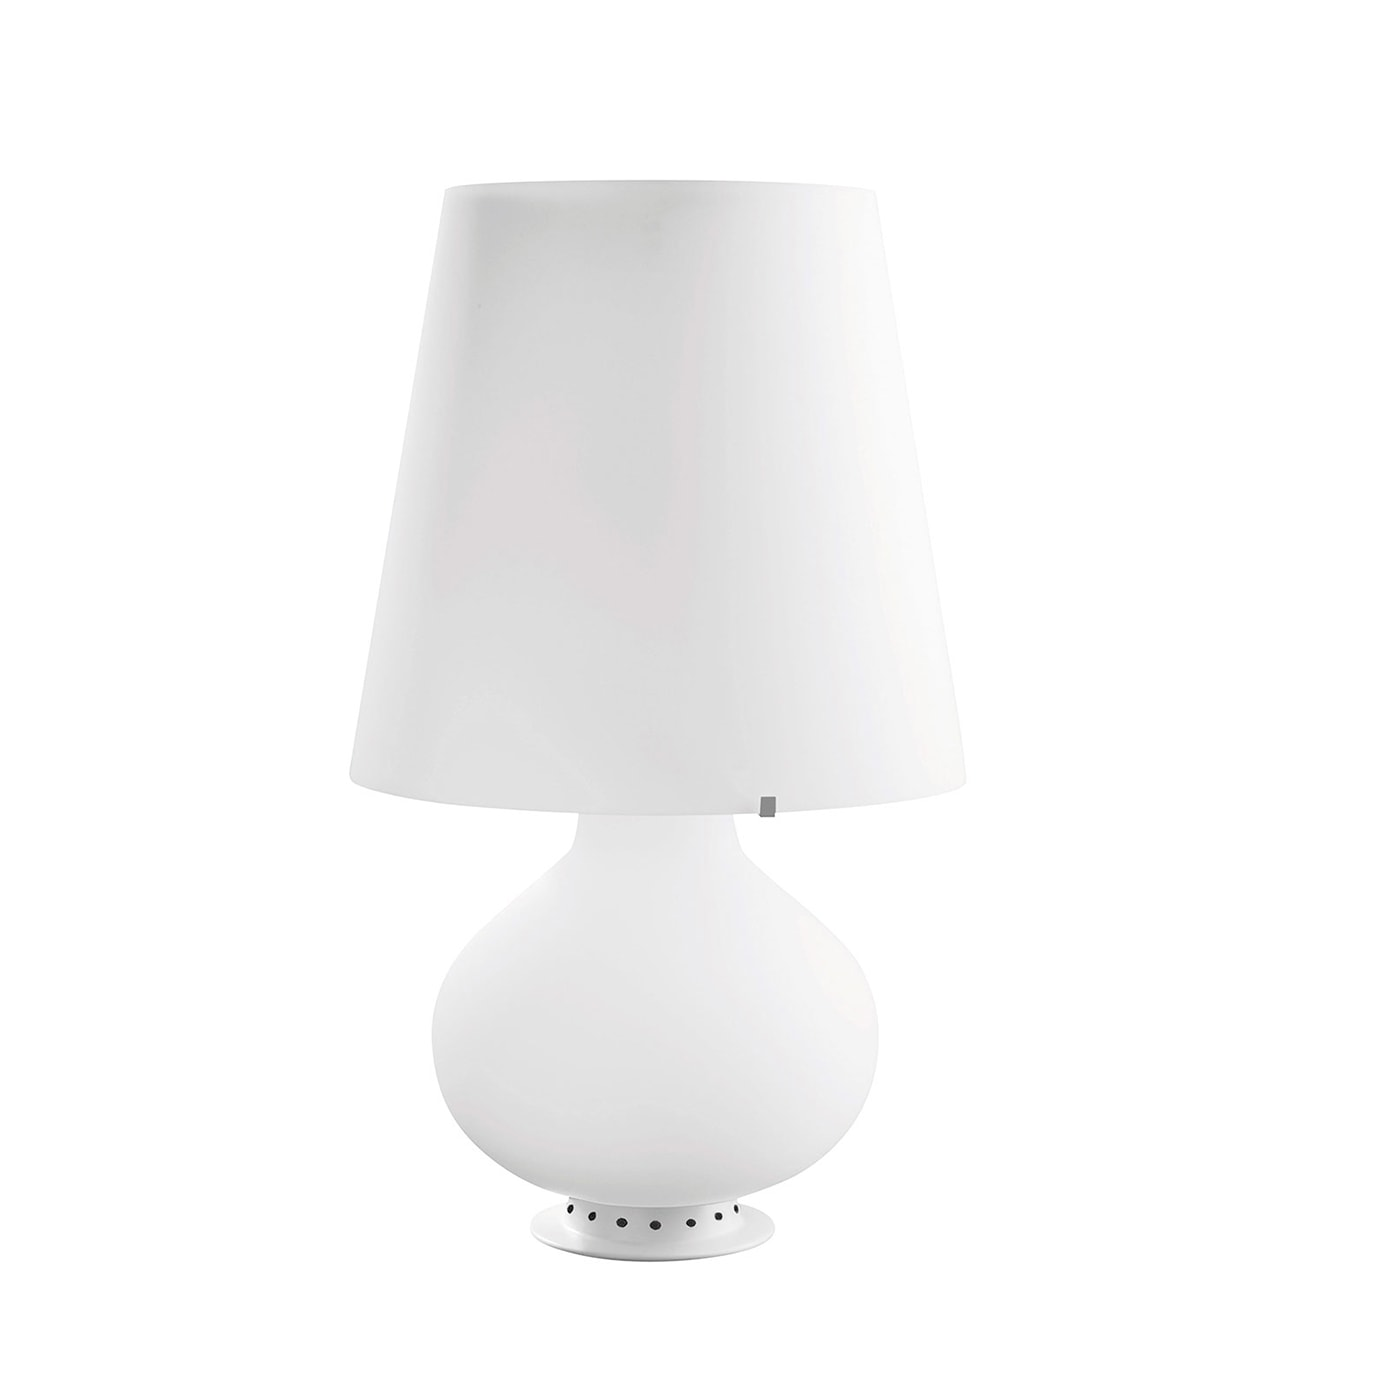 Fontanta Arte lampada da tavolo